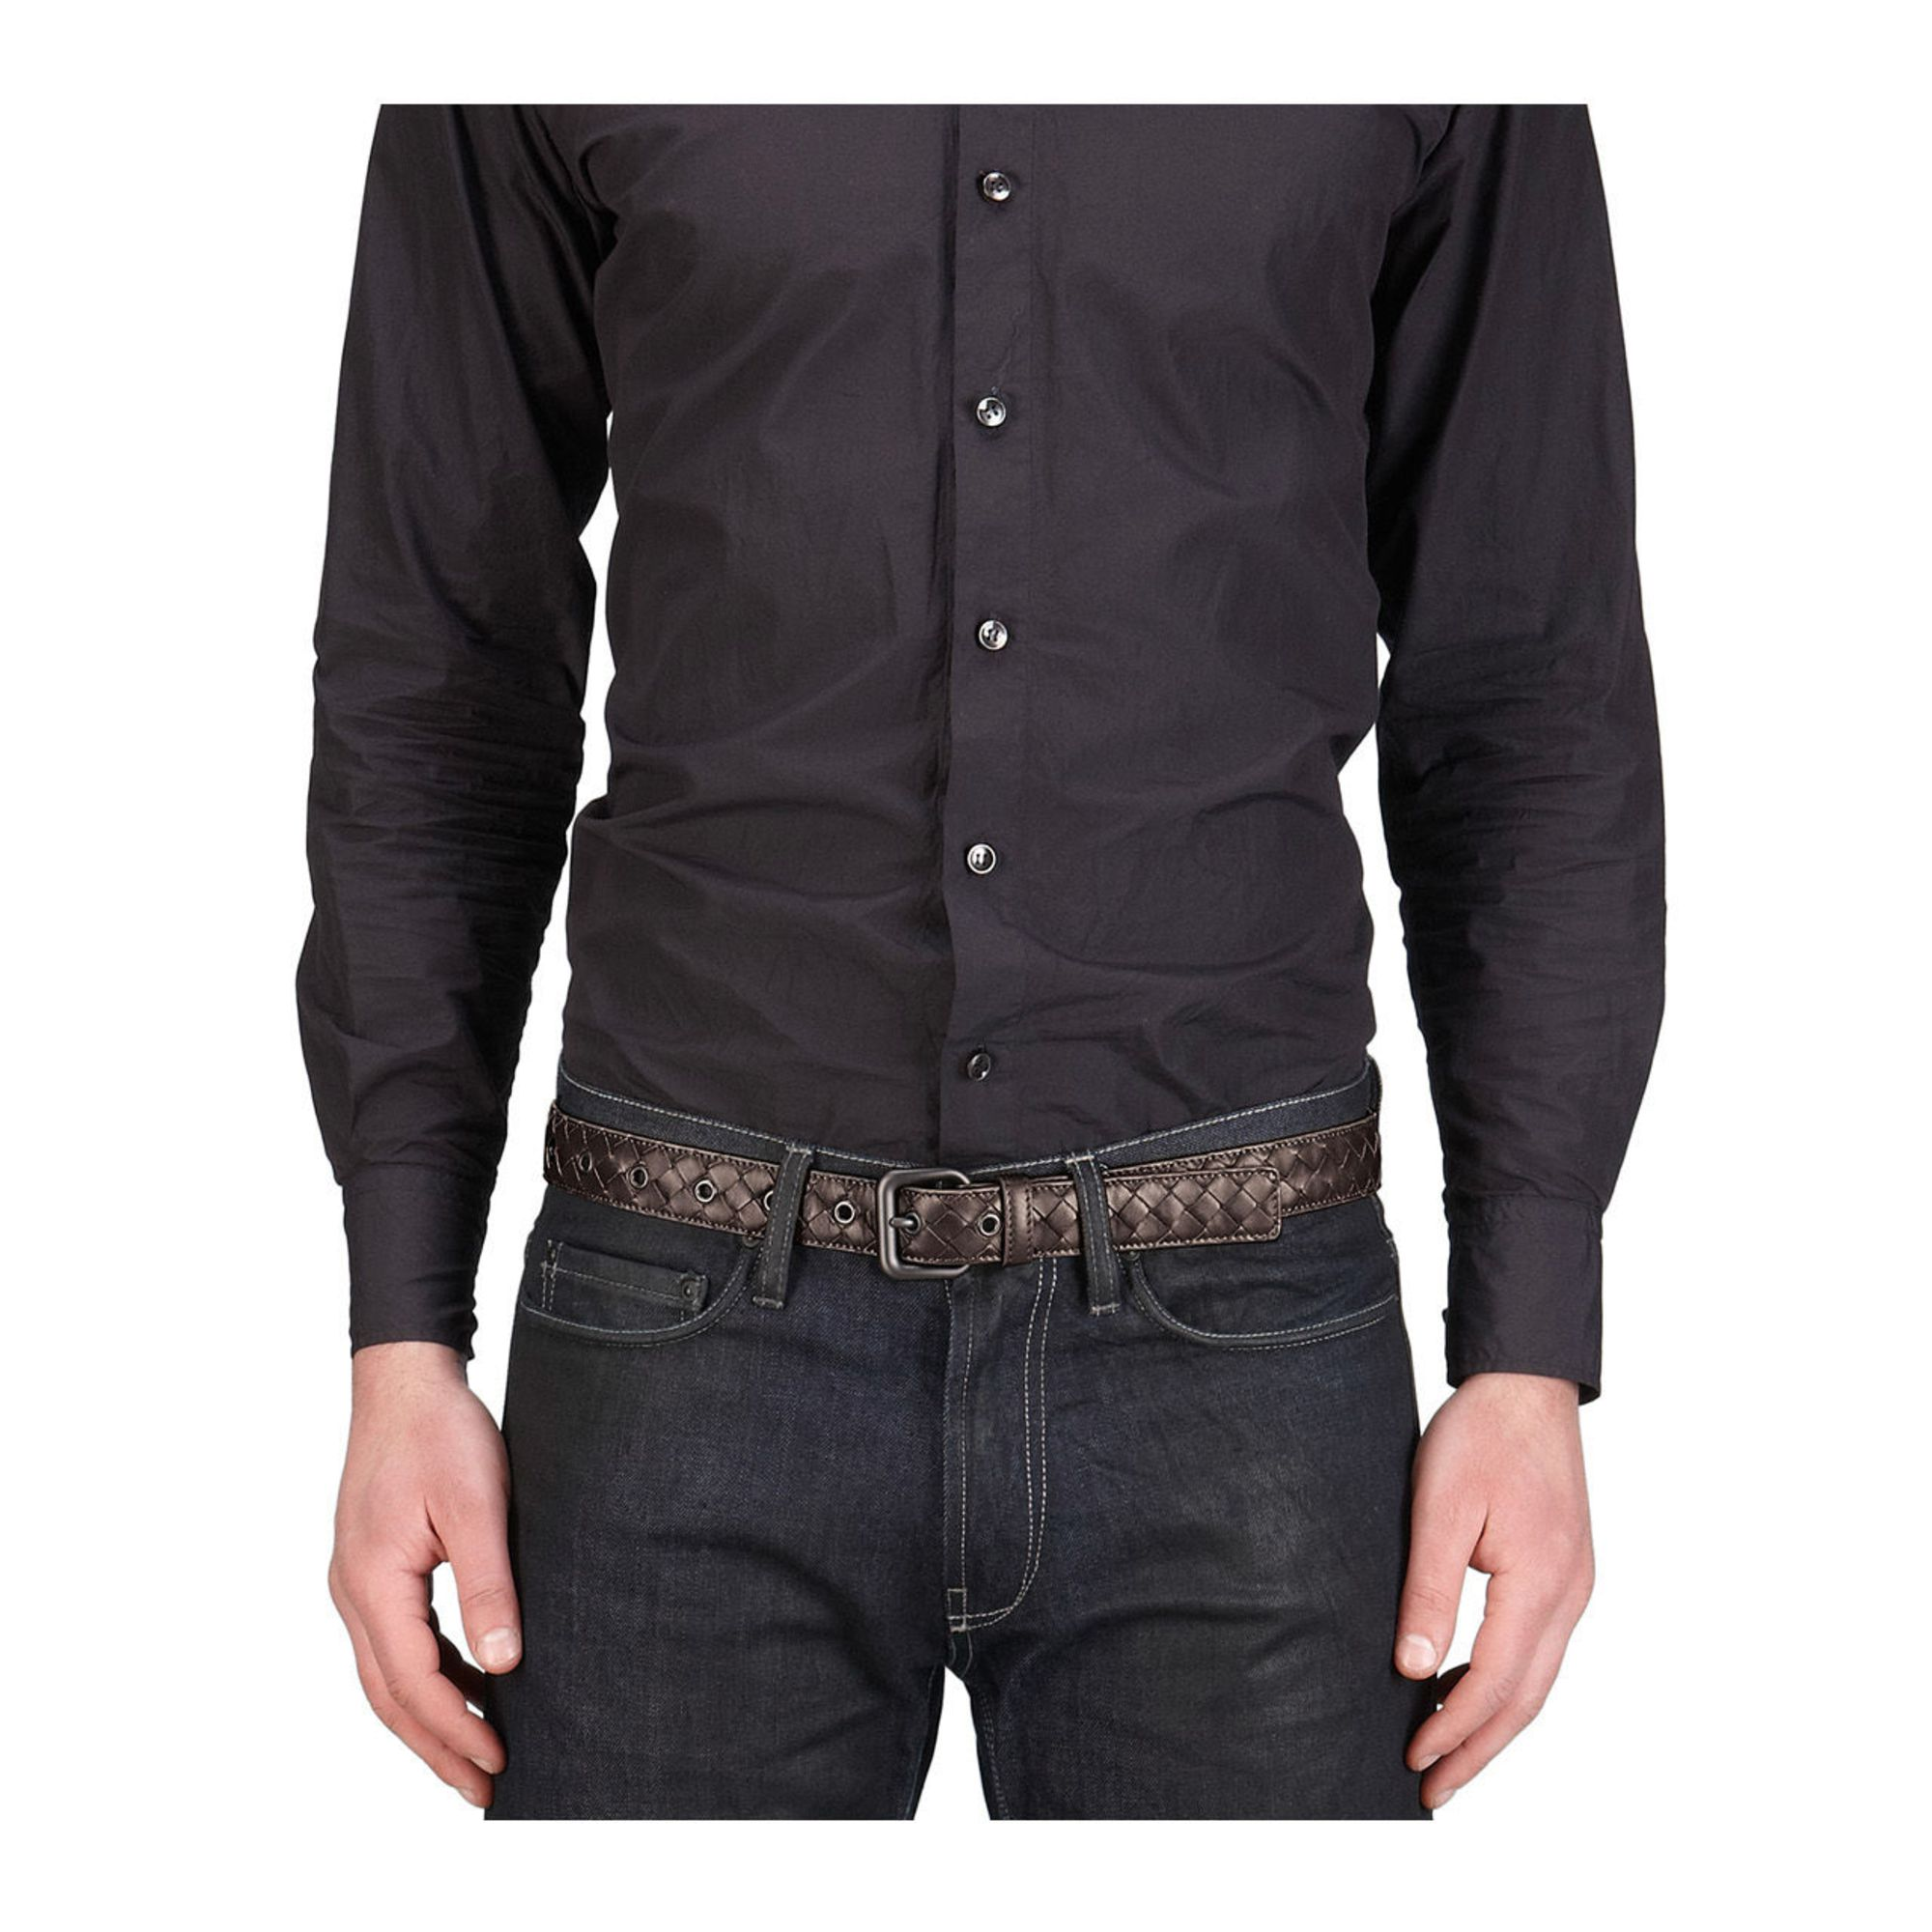 veneta men Shop designer items by bottega veneta online choose the perfect piece for you: easy, quick returns and secure payment.